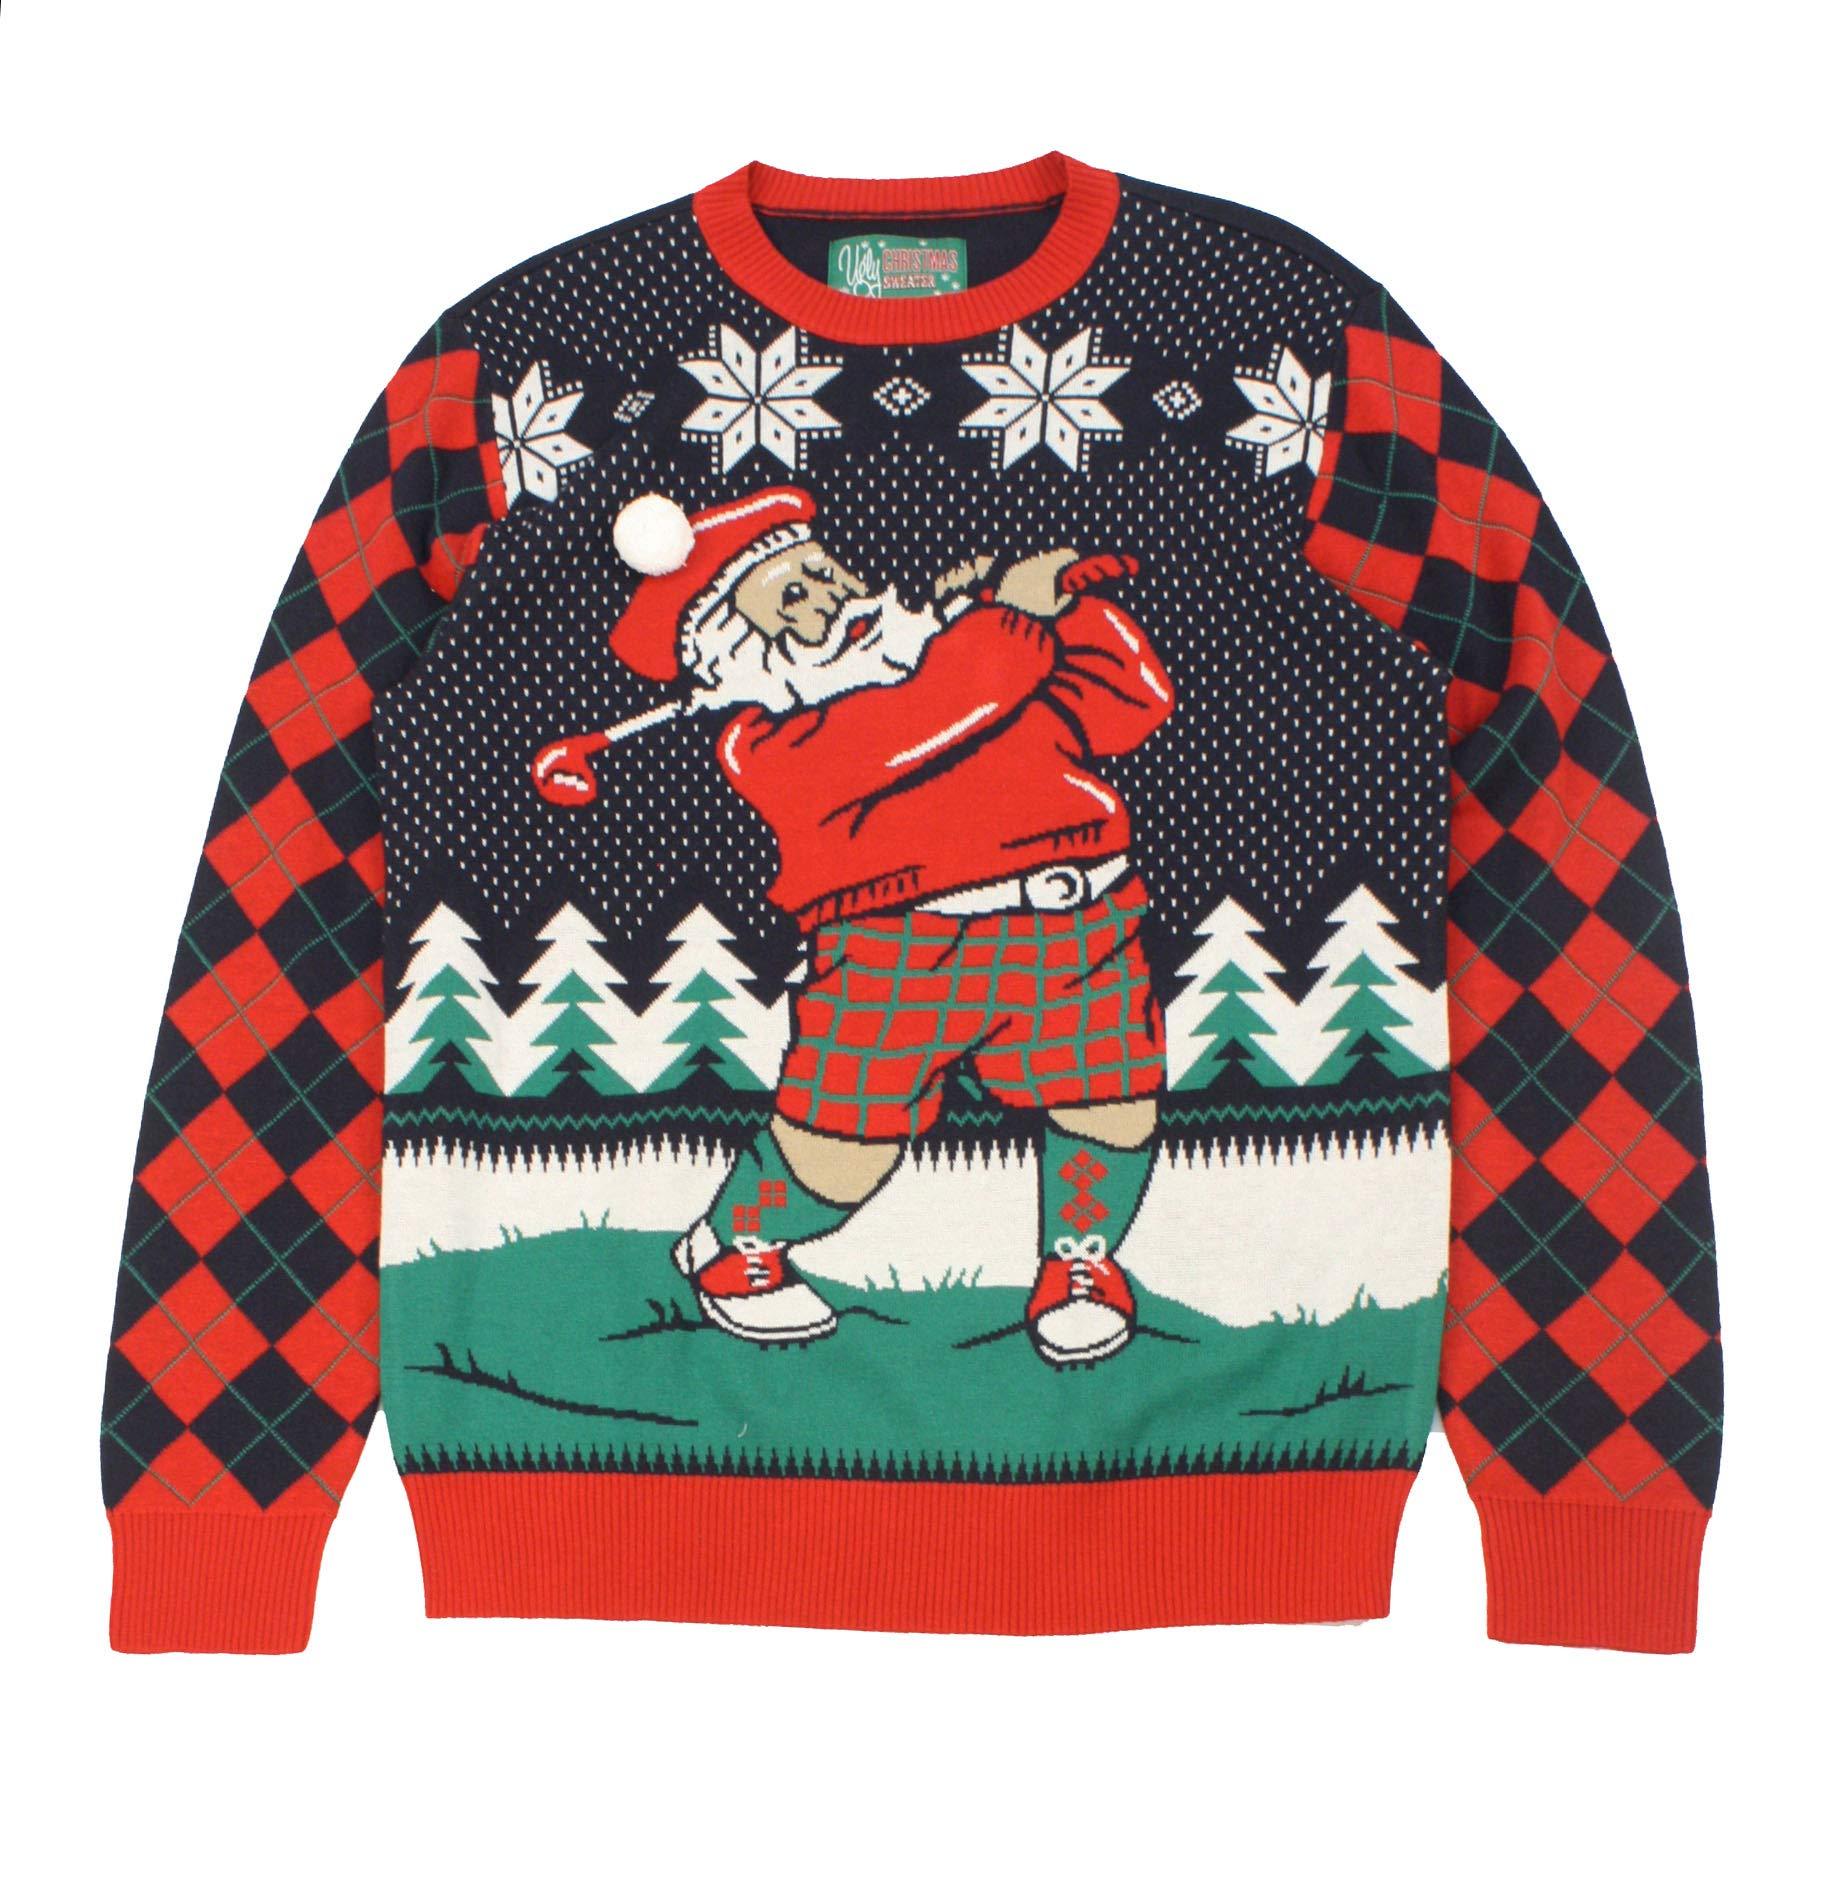 Plus Size Ugly Christmas Sweater.Ugly Christmas Sweater Plus Size Women S Golfing Santa Sweatshirt